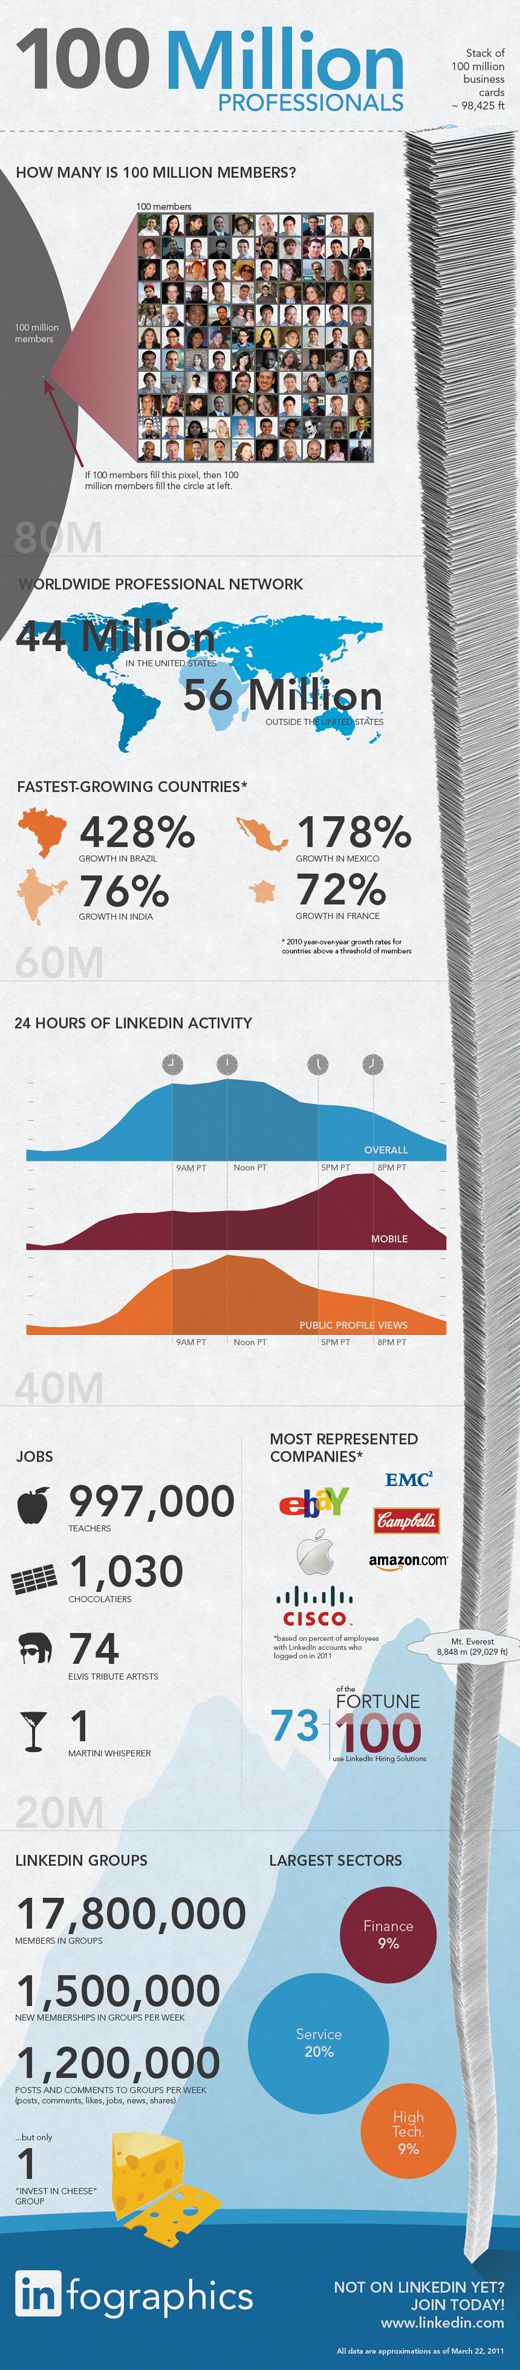 100 Million Professionals via LinkedIn - how/when professionals are using LinkedIn